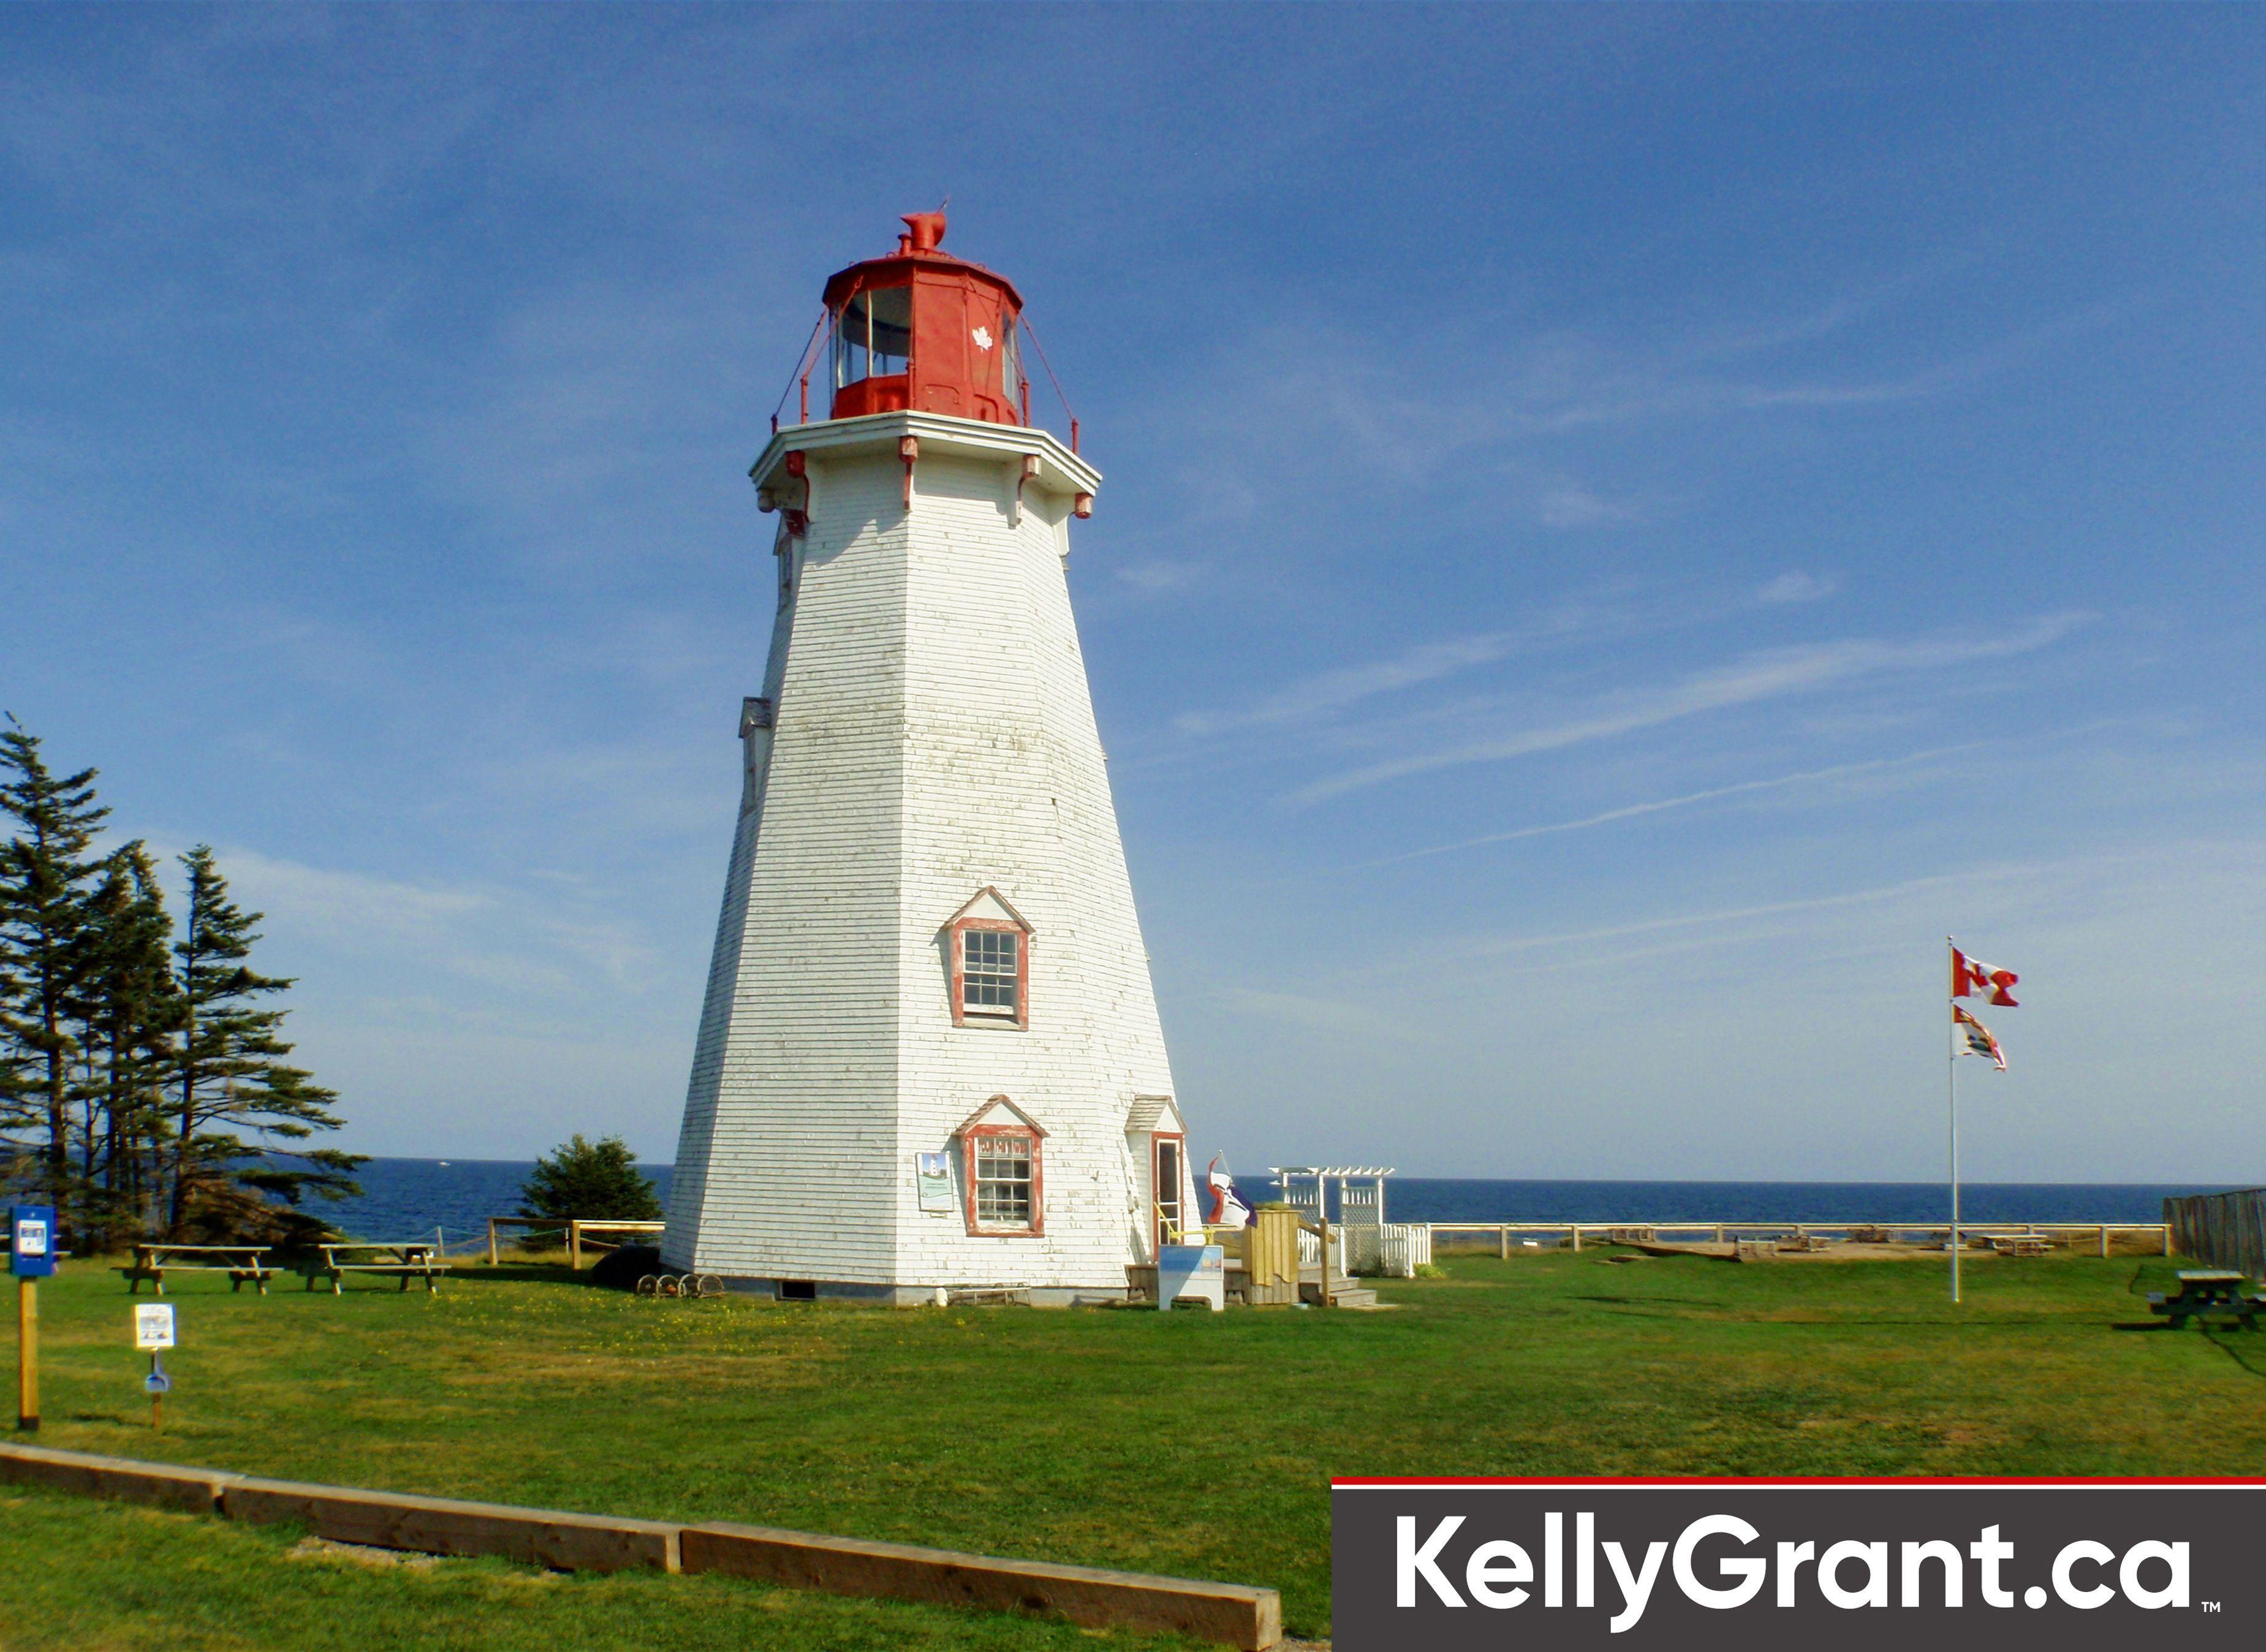 Kelly grant Gallery Photo